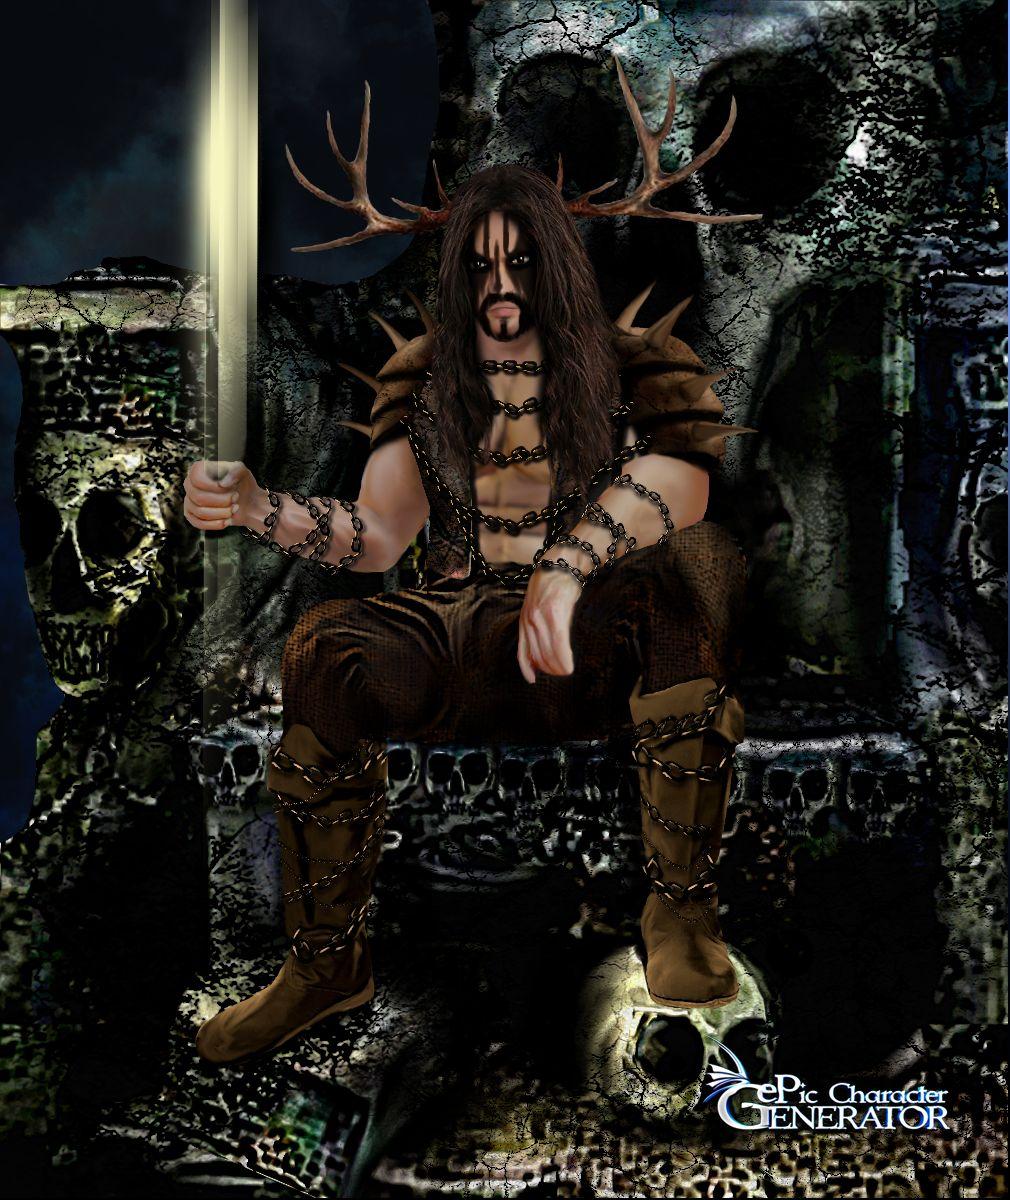 ePic Character Generator Season 3 Throne Savage Screenshot 1